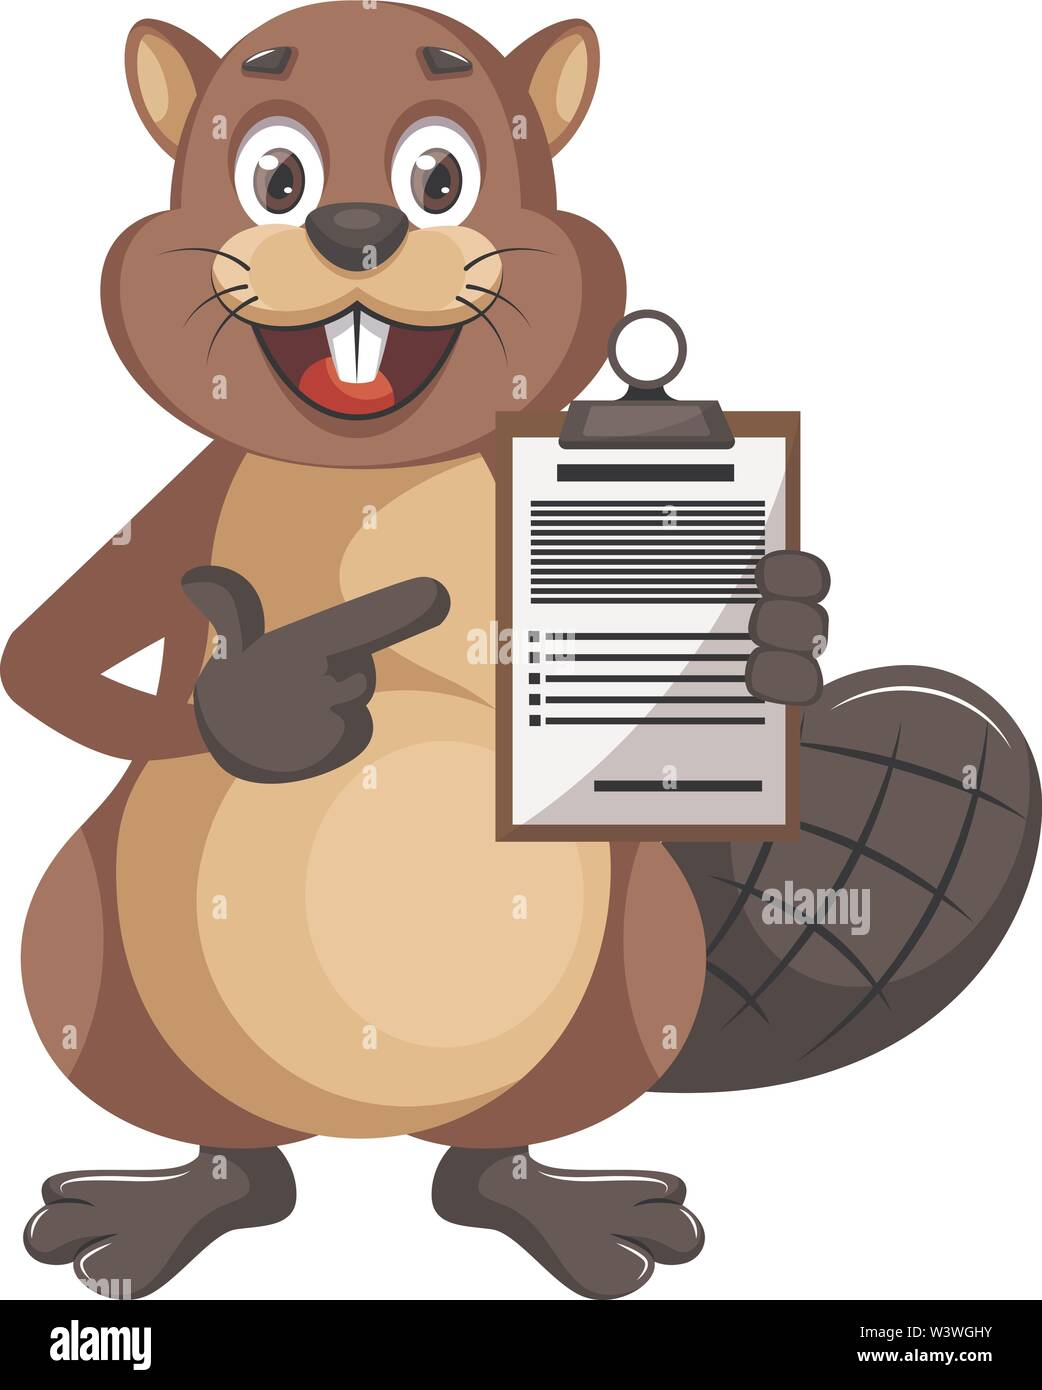 Beaver holding construction notepad, illustration, vector on white background. - Stock Image